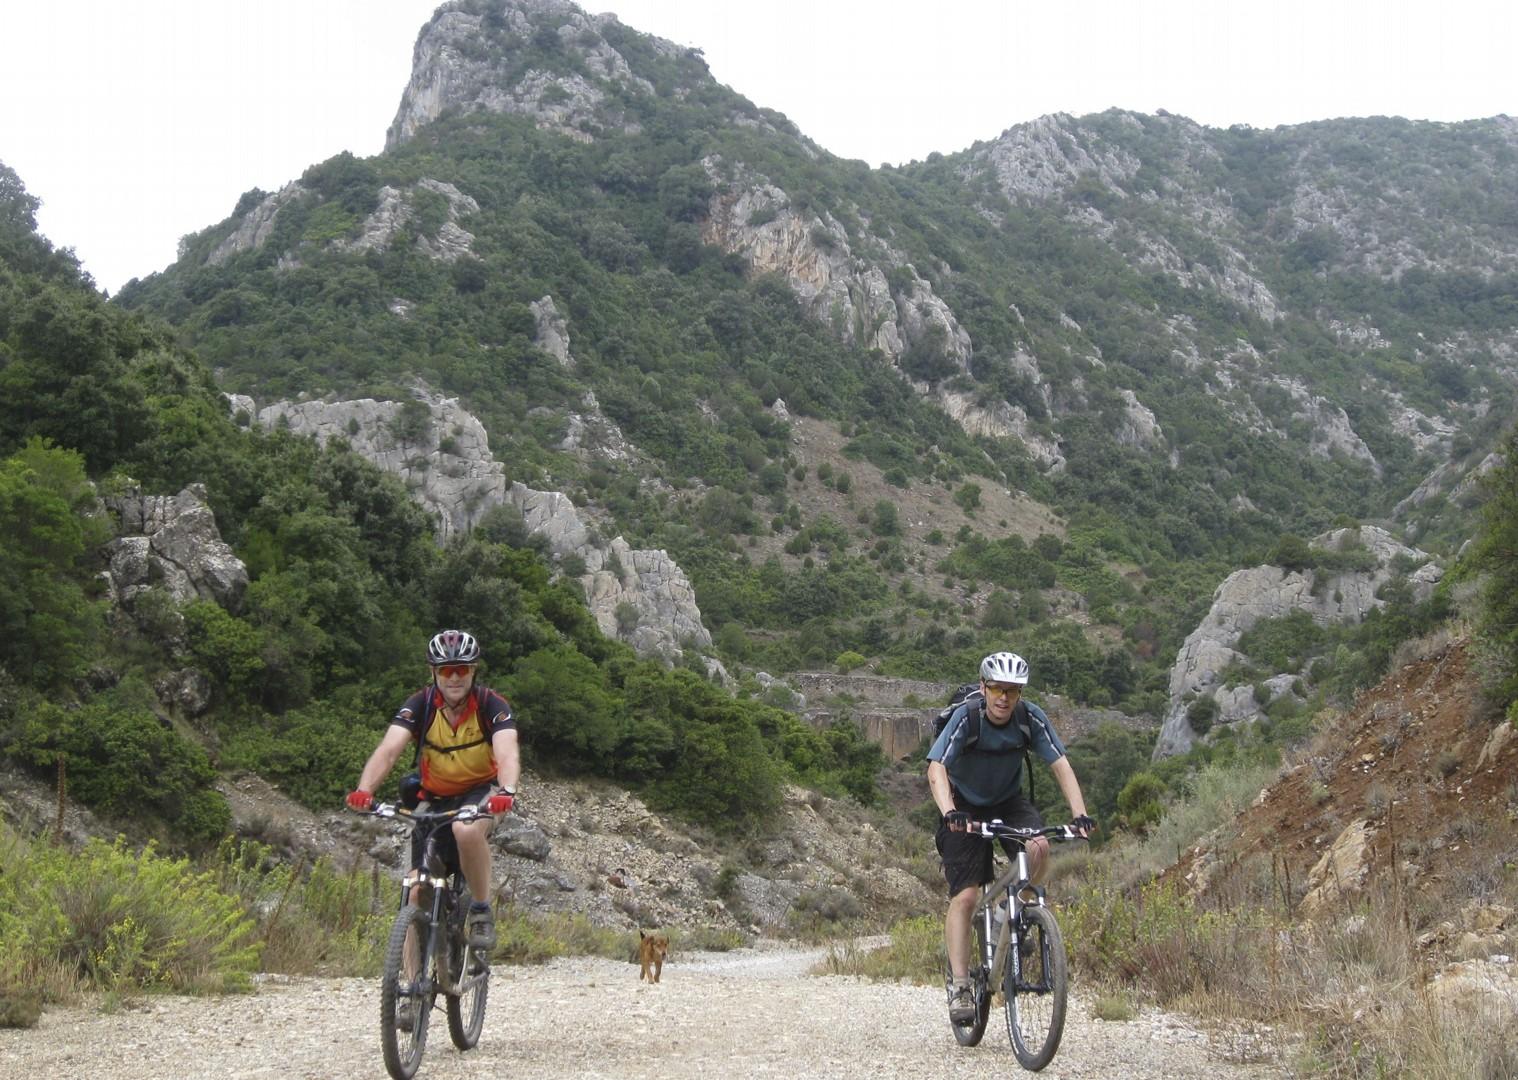 4113919595_5423988c99_o.jpg - Sardinia - La Costa Verde - Guided Mountain Bike Holiday - Italia Mountain Biking